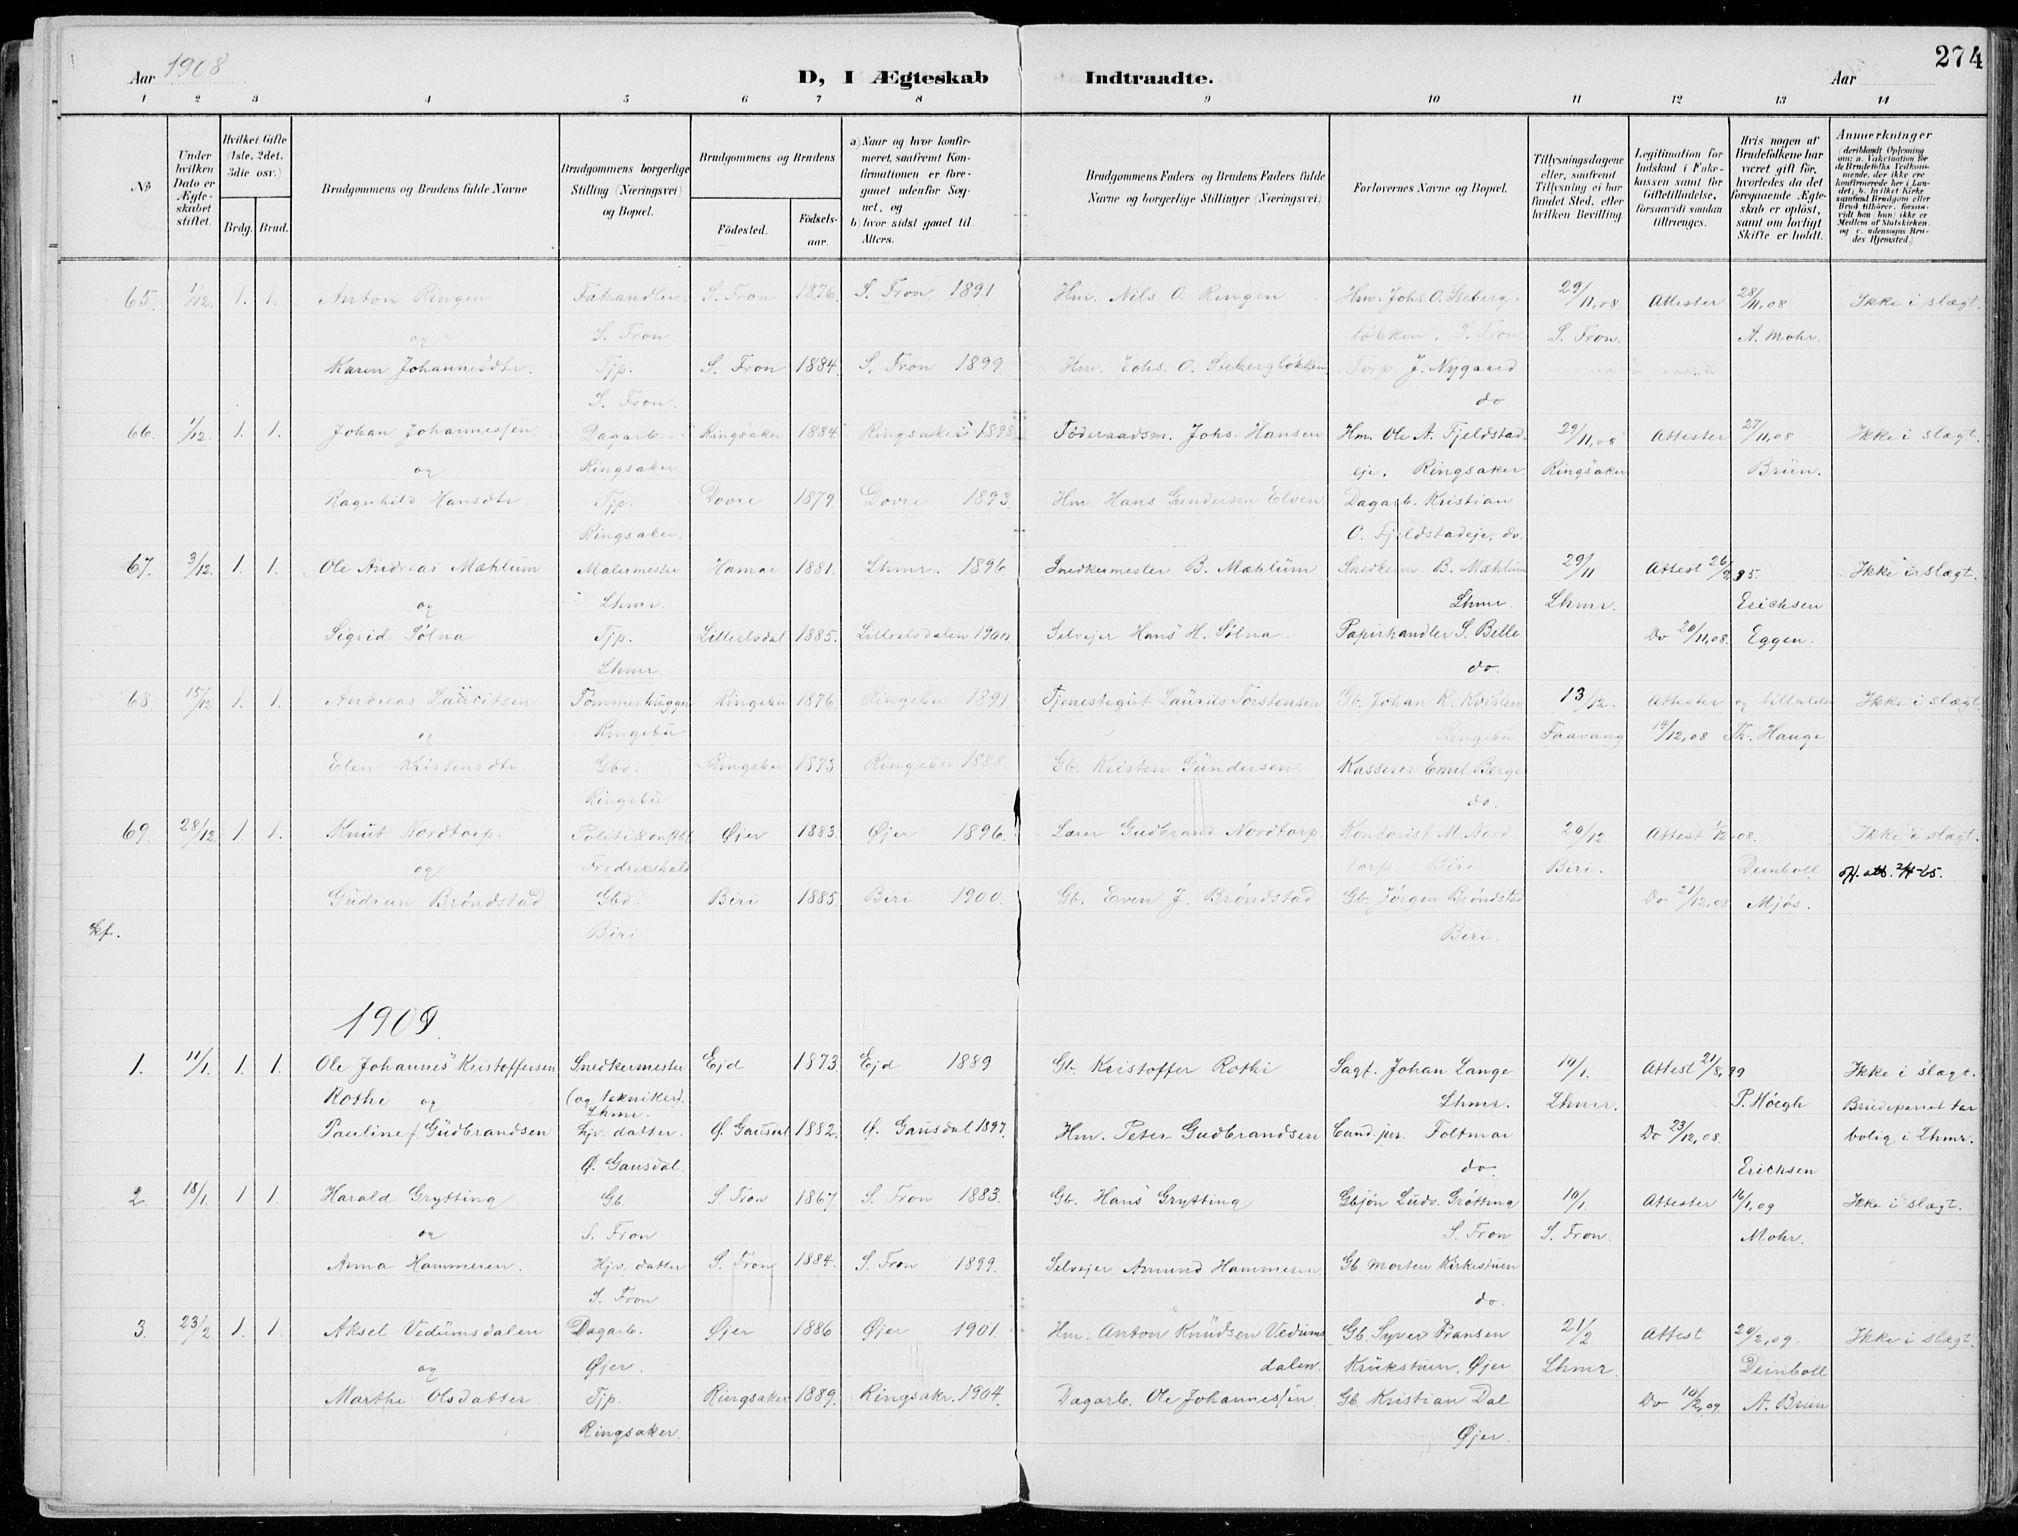 SAH, Lillehammer prestekontor, Ministerialbok nr. 1, 1901-1916, s. 274